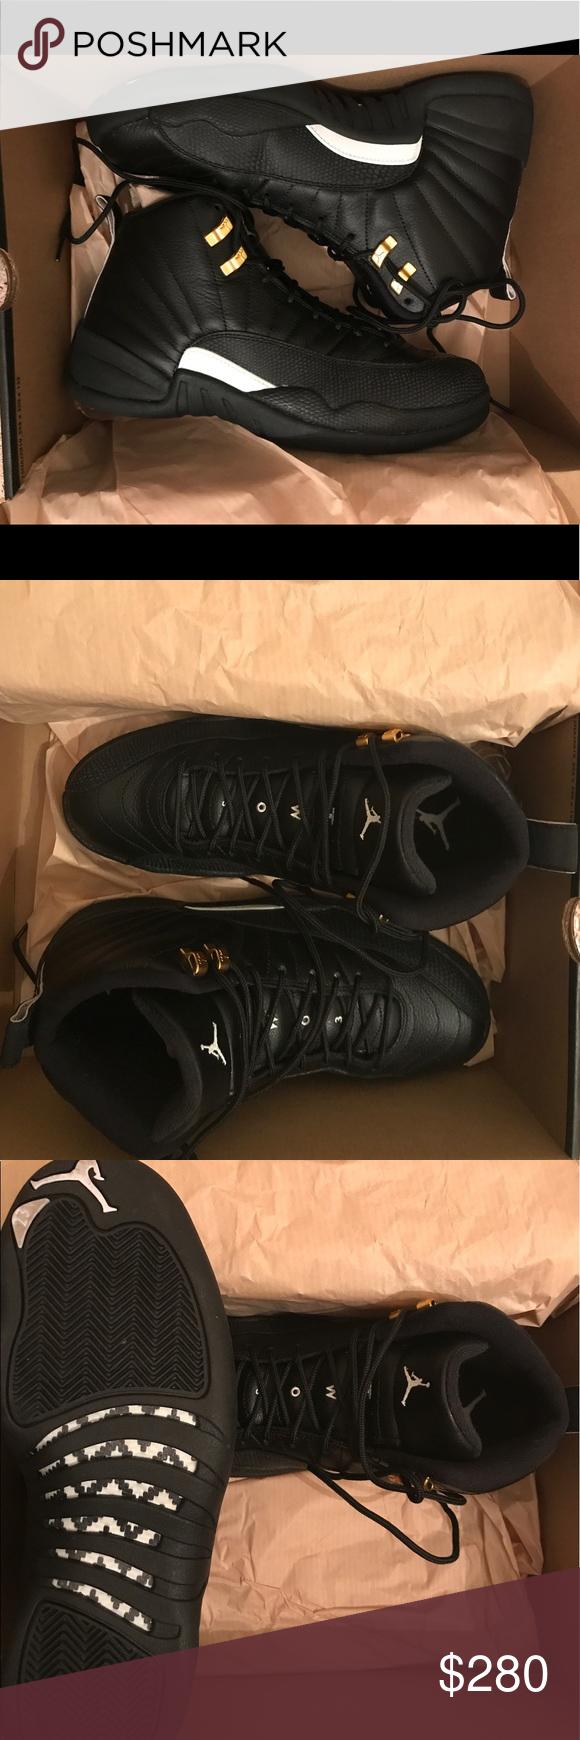 4e21601d0ebc36 Jordan xii jordan xii air jordan shoes and athletic shoes png 580x1740  Jordans card boards